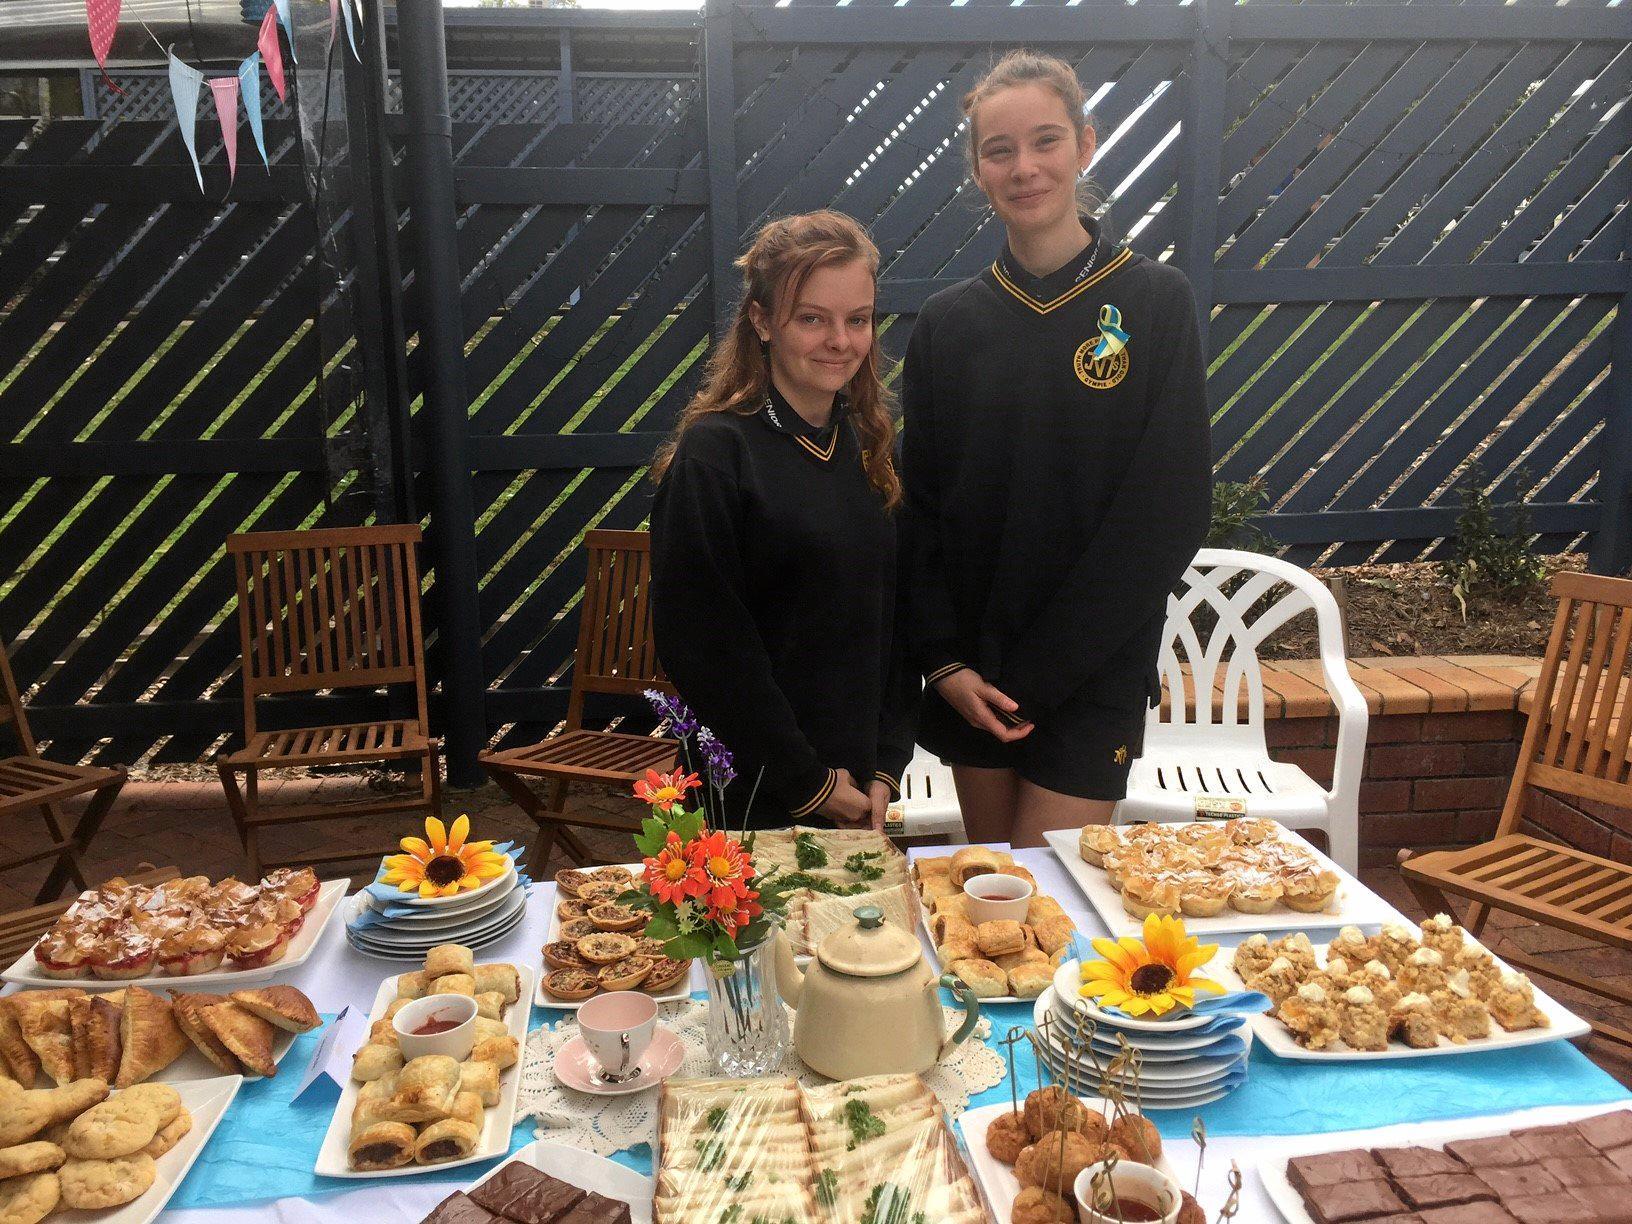 Year 11 Hospitality students Paige Jackson and Ateisha Hutchings-Ryan